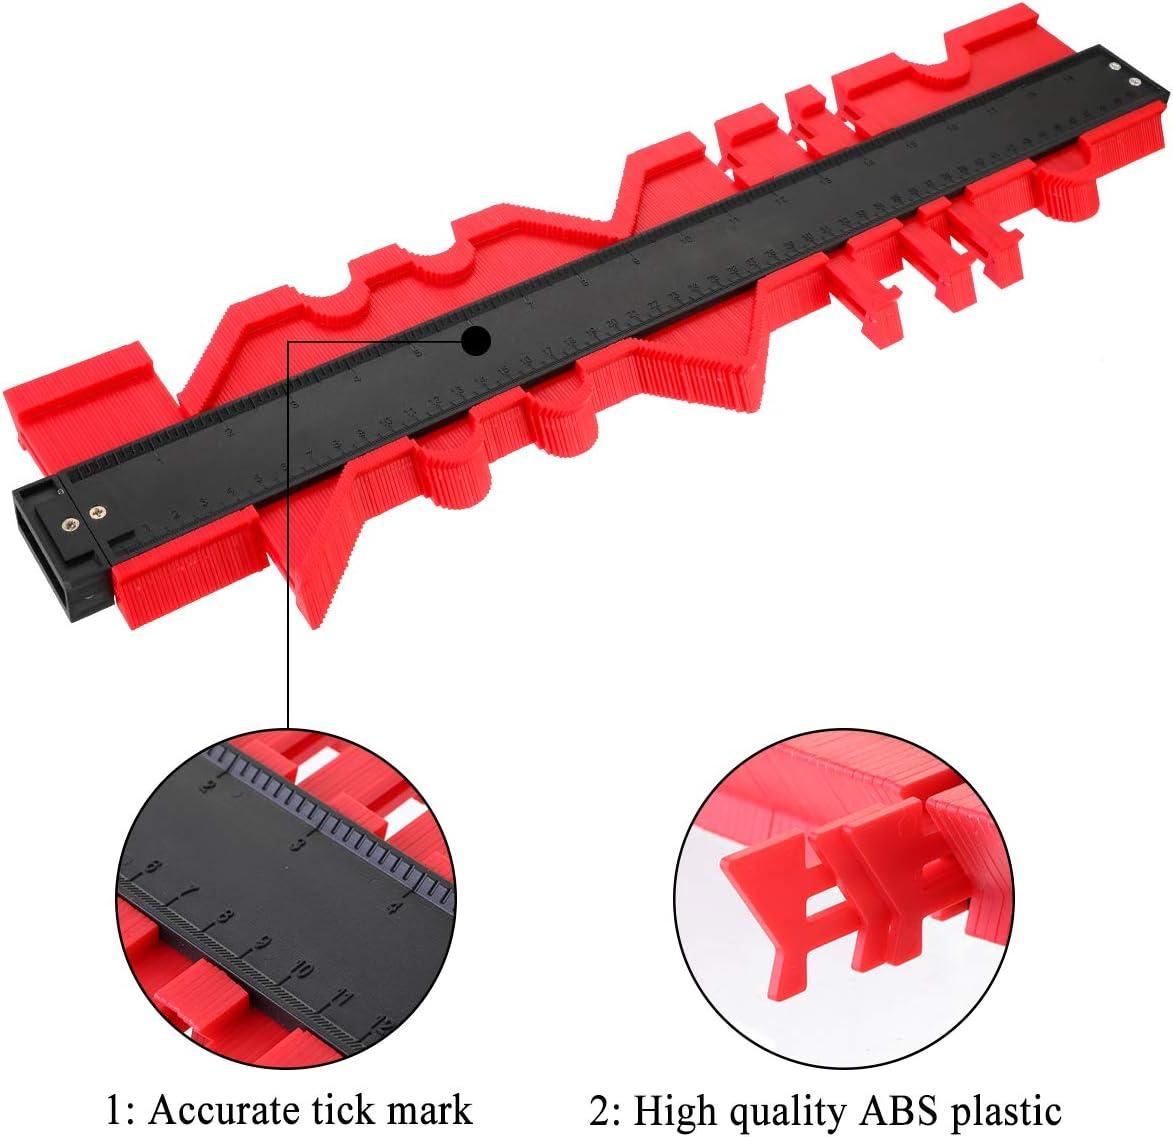 Contour Gauge Duplicator Profile Measuring Tool Plastic Woodworking Shape Tracing Template Contour Copy Duplicator 9.8in//25cm, Green Circular Frame Profile Gauge Ruled